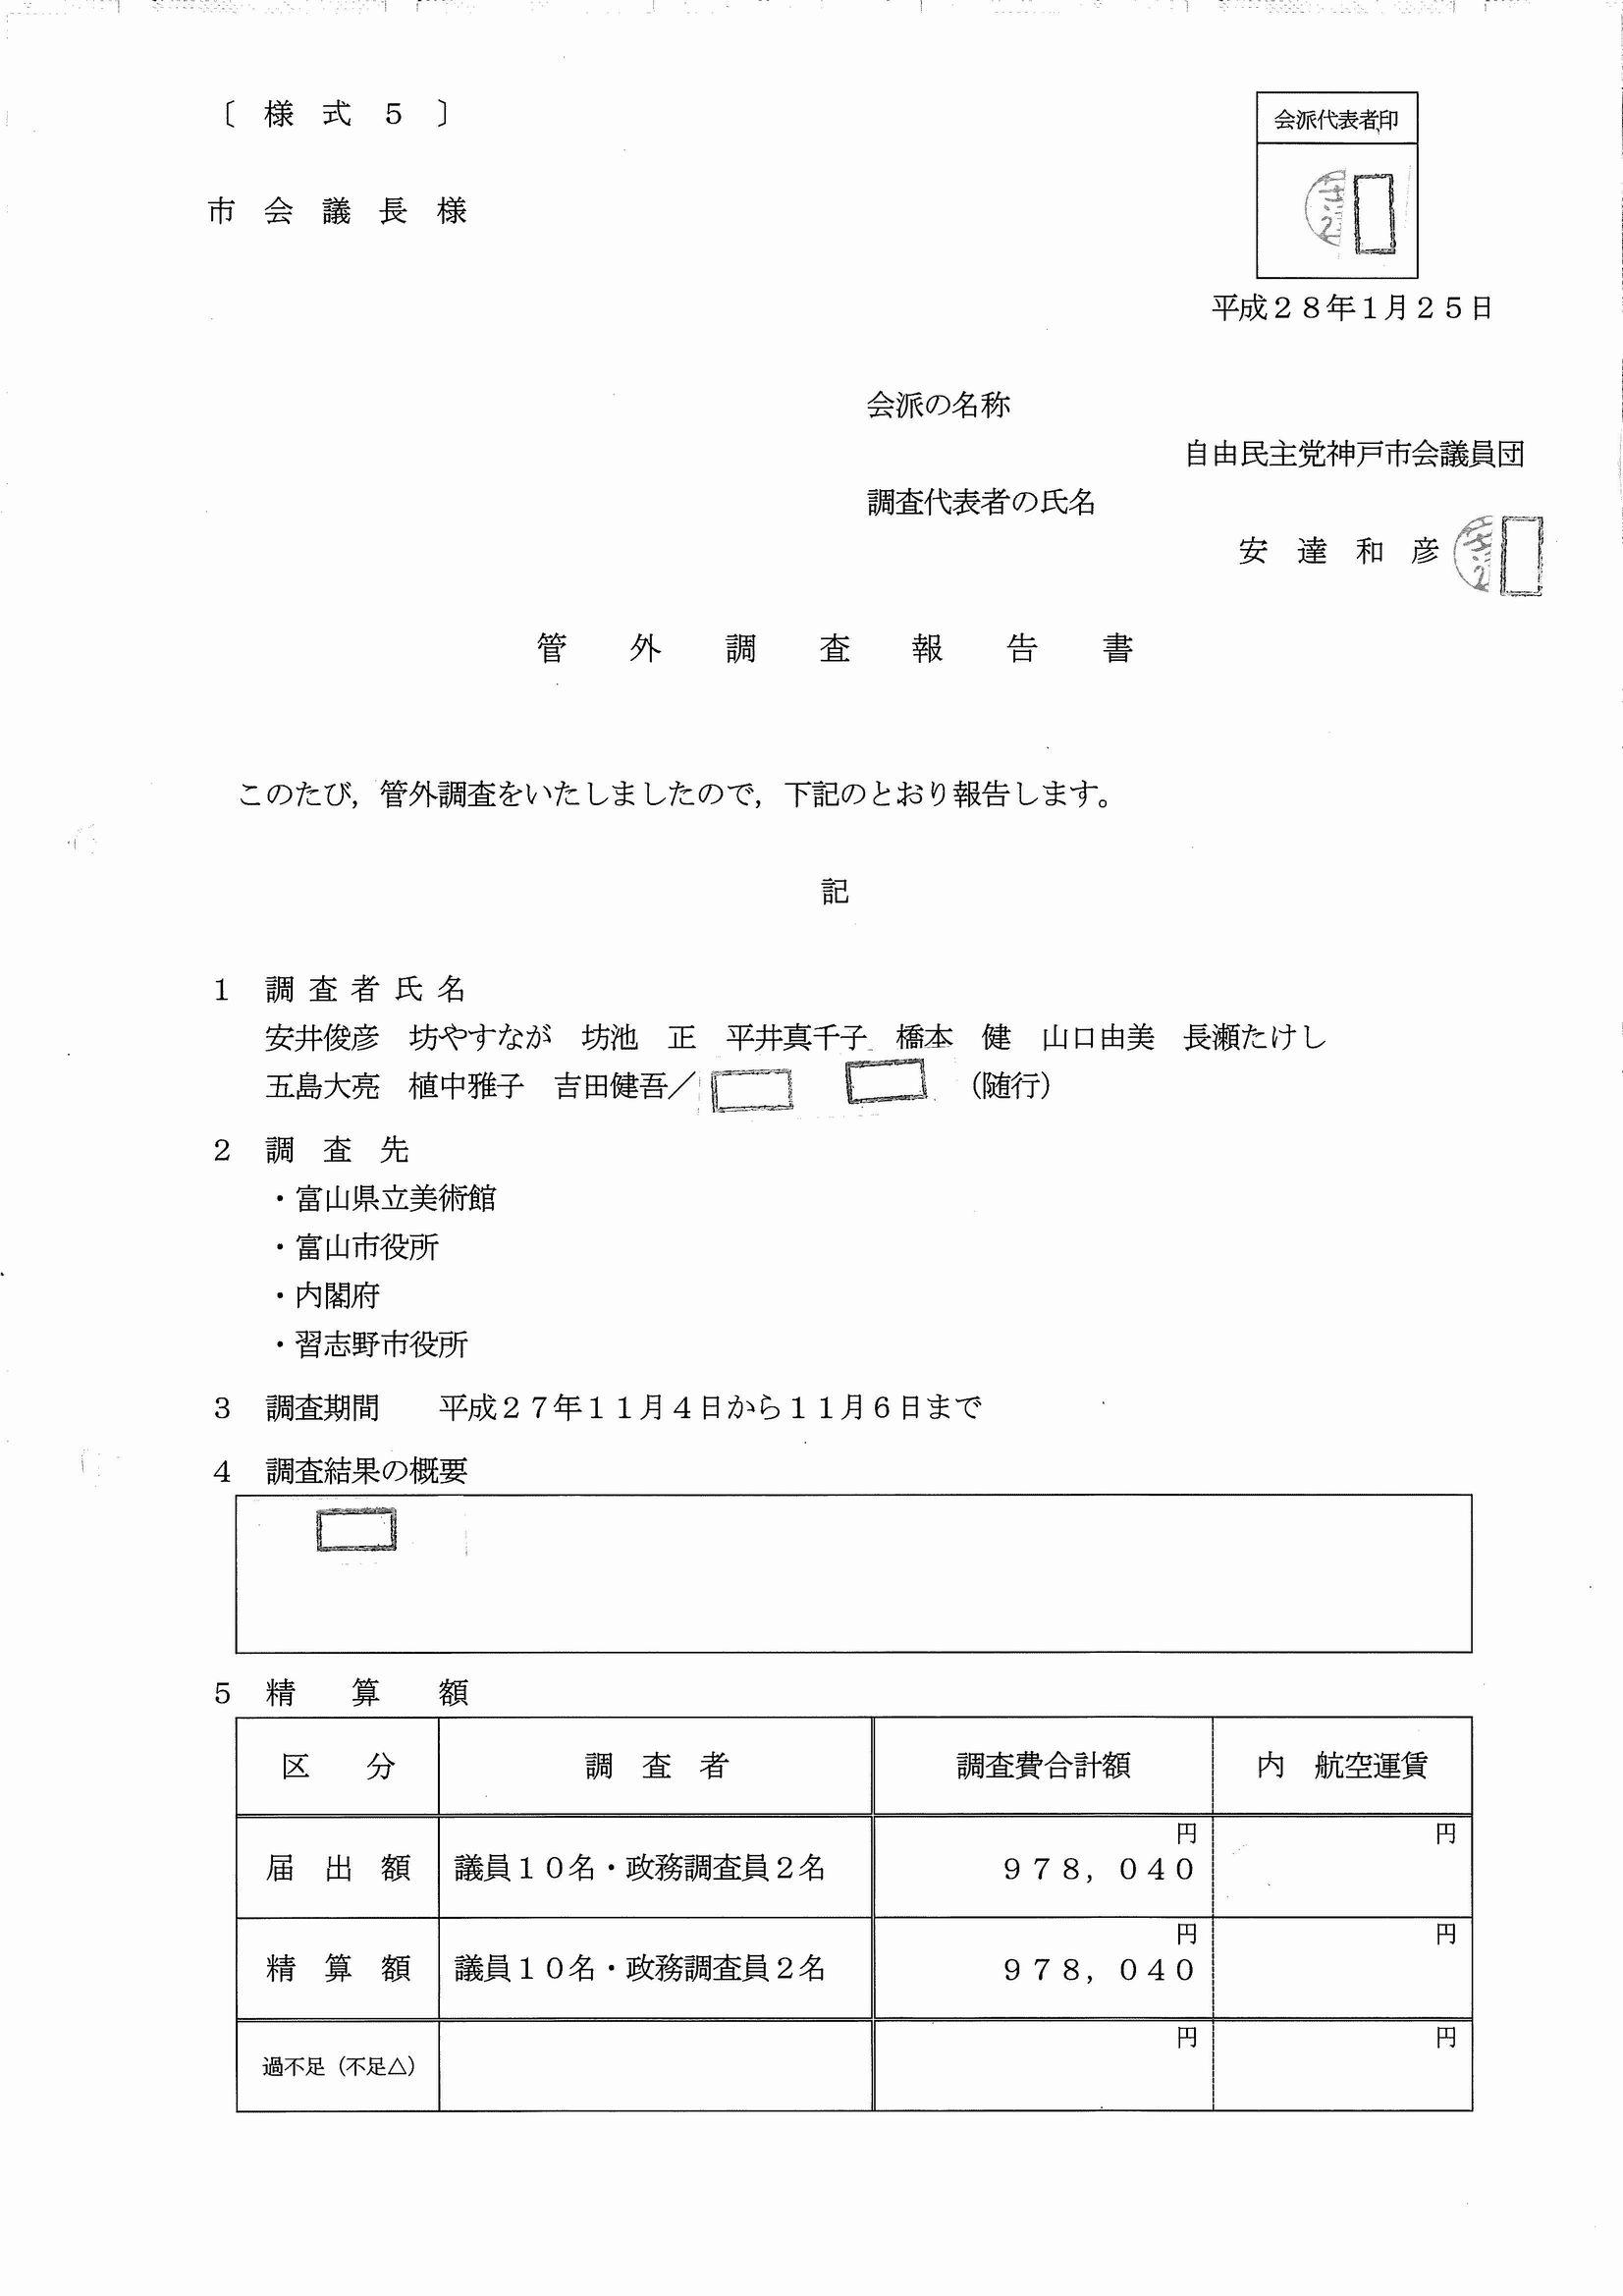 神戸市議会政務活動費 ネットに領収書公開も支出先個人名非公開に変更_d0011701_22582338.jpg